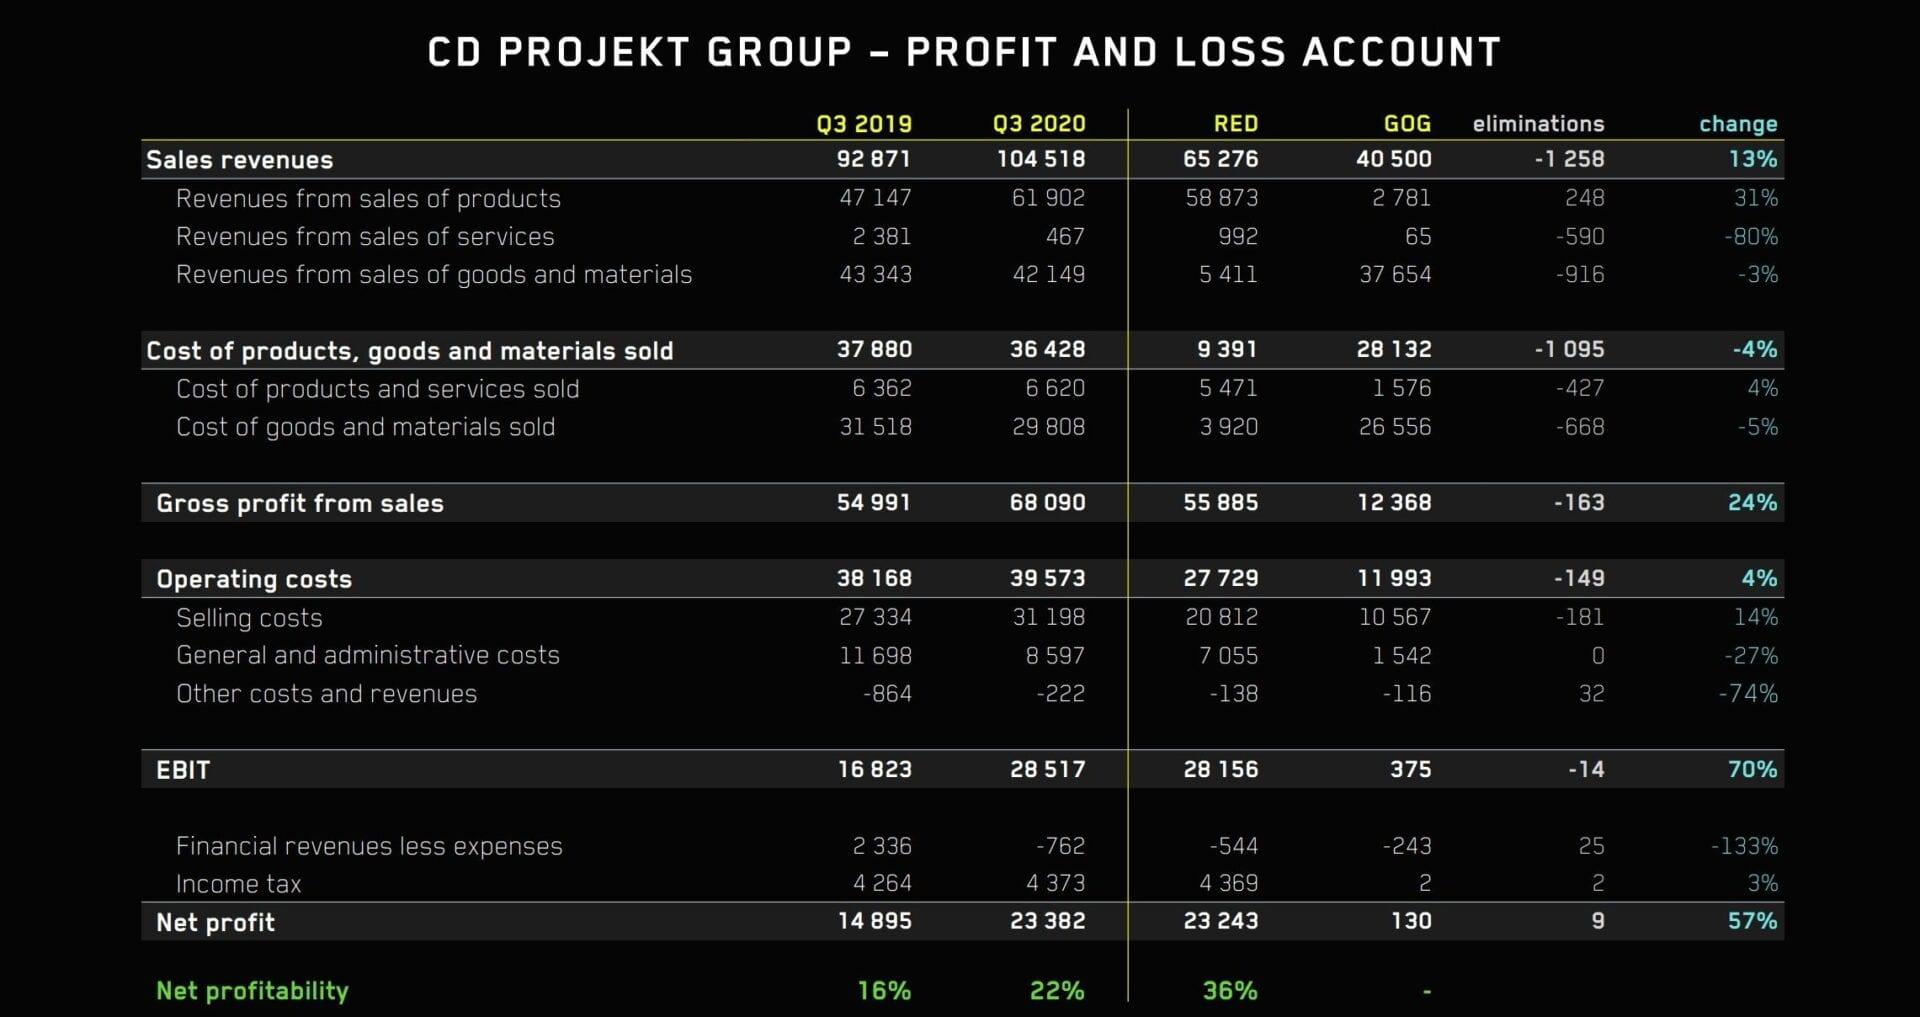 Cyberpunk 2077 Developer CD Projekt RED Declares Sturdy Monetary Outcomes Regardless of Delays 1